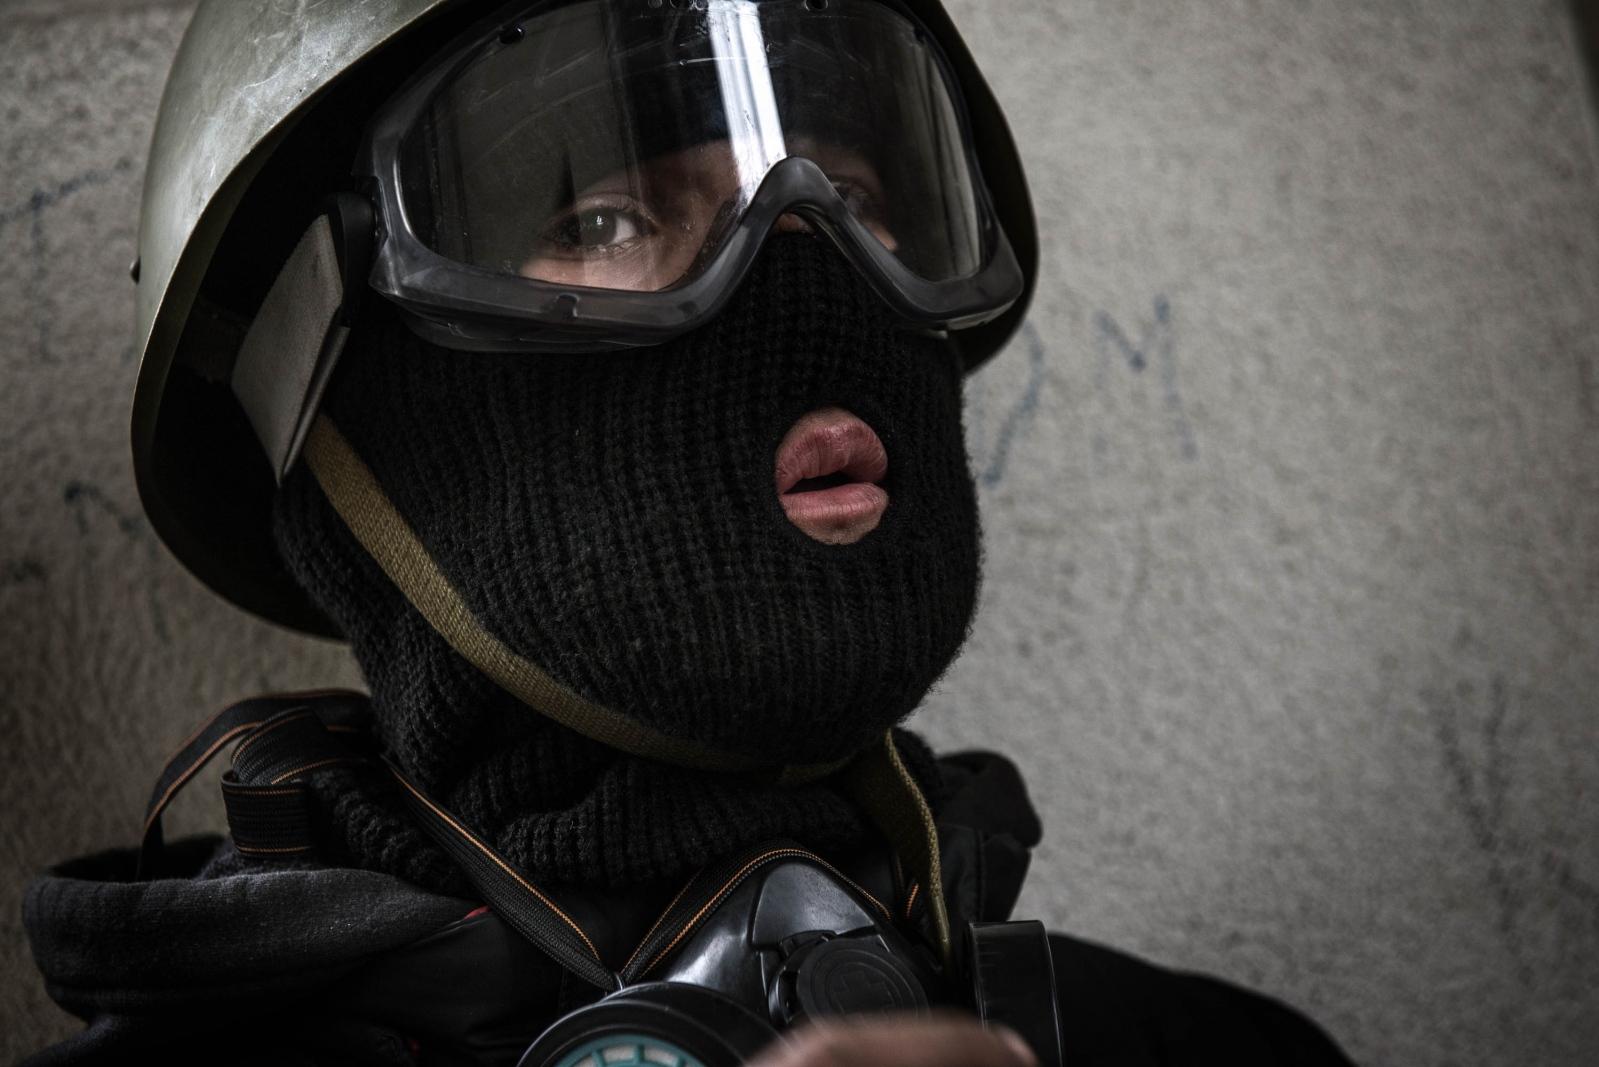 Art and Documentary Photography - Loading Behind_Kiev_s_barricades_031.jpg